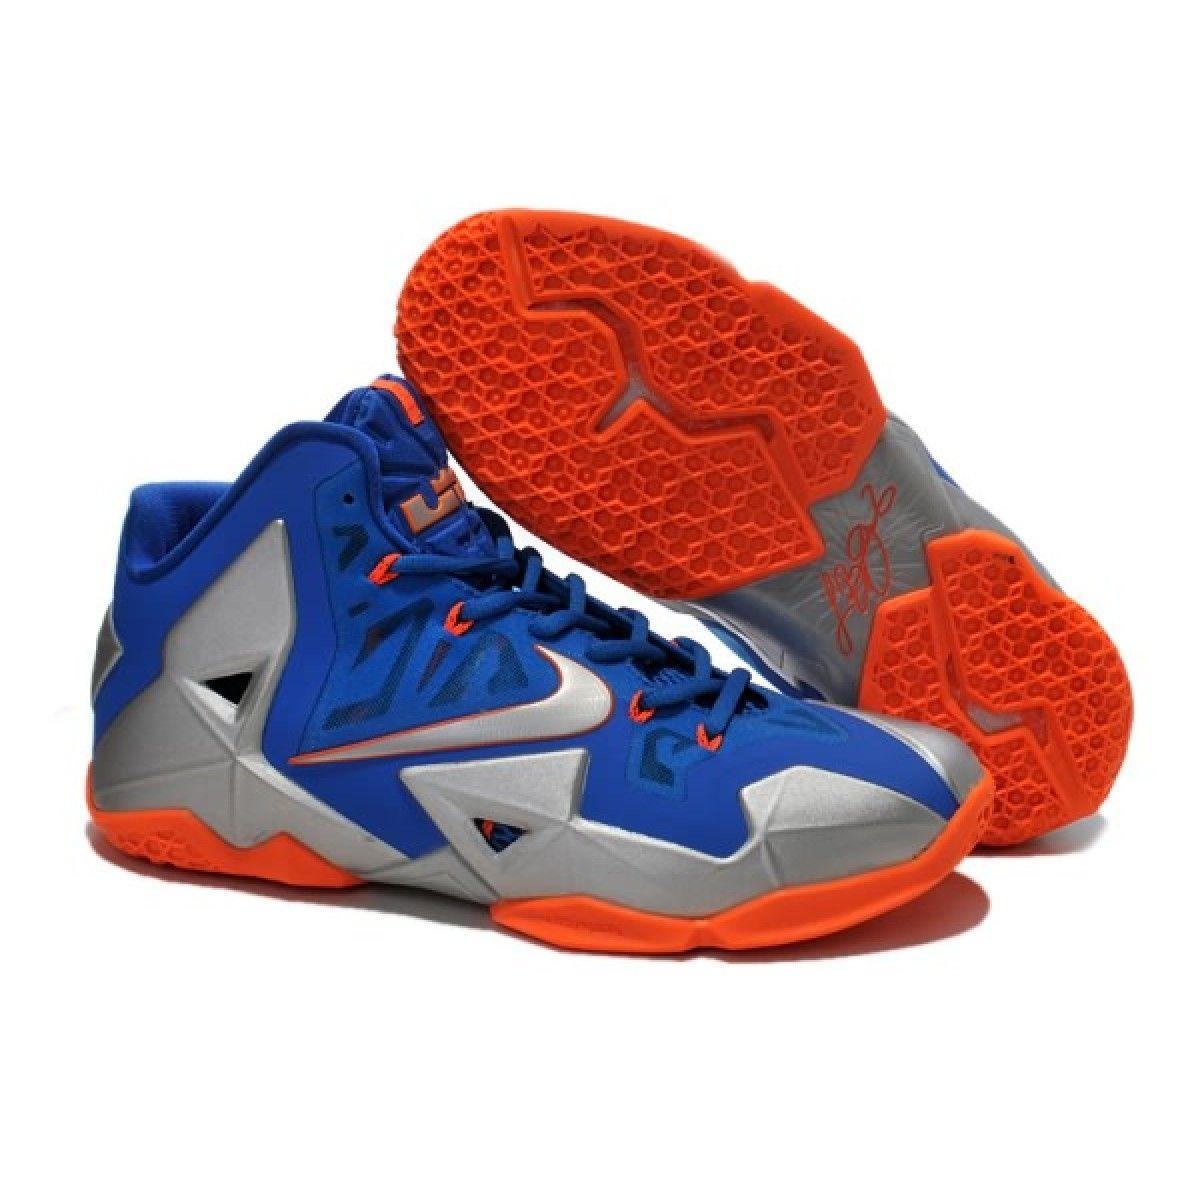 Nike Lebron 11 Blue Grey Orange Shoes, cheap Lebron 11 Mens, If you want to  look Nike Lebron 11 Blue Grey Orange Shoes, you can view the Lebron 11 Mens  ...